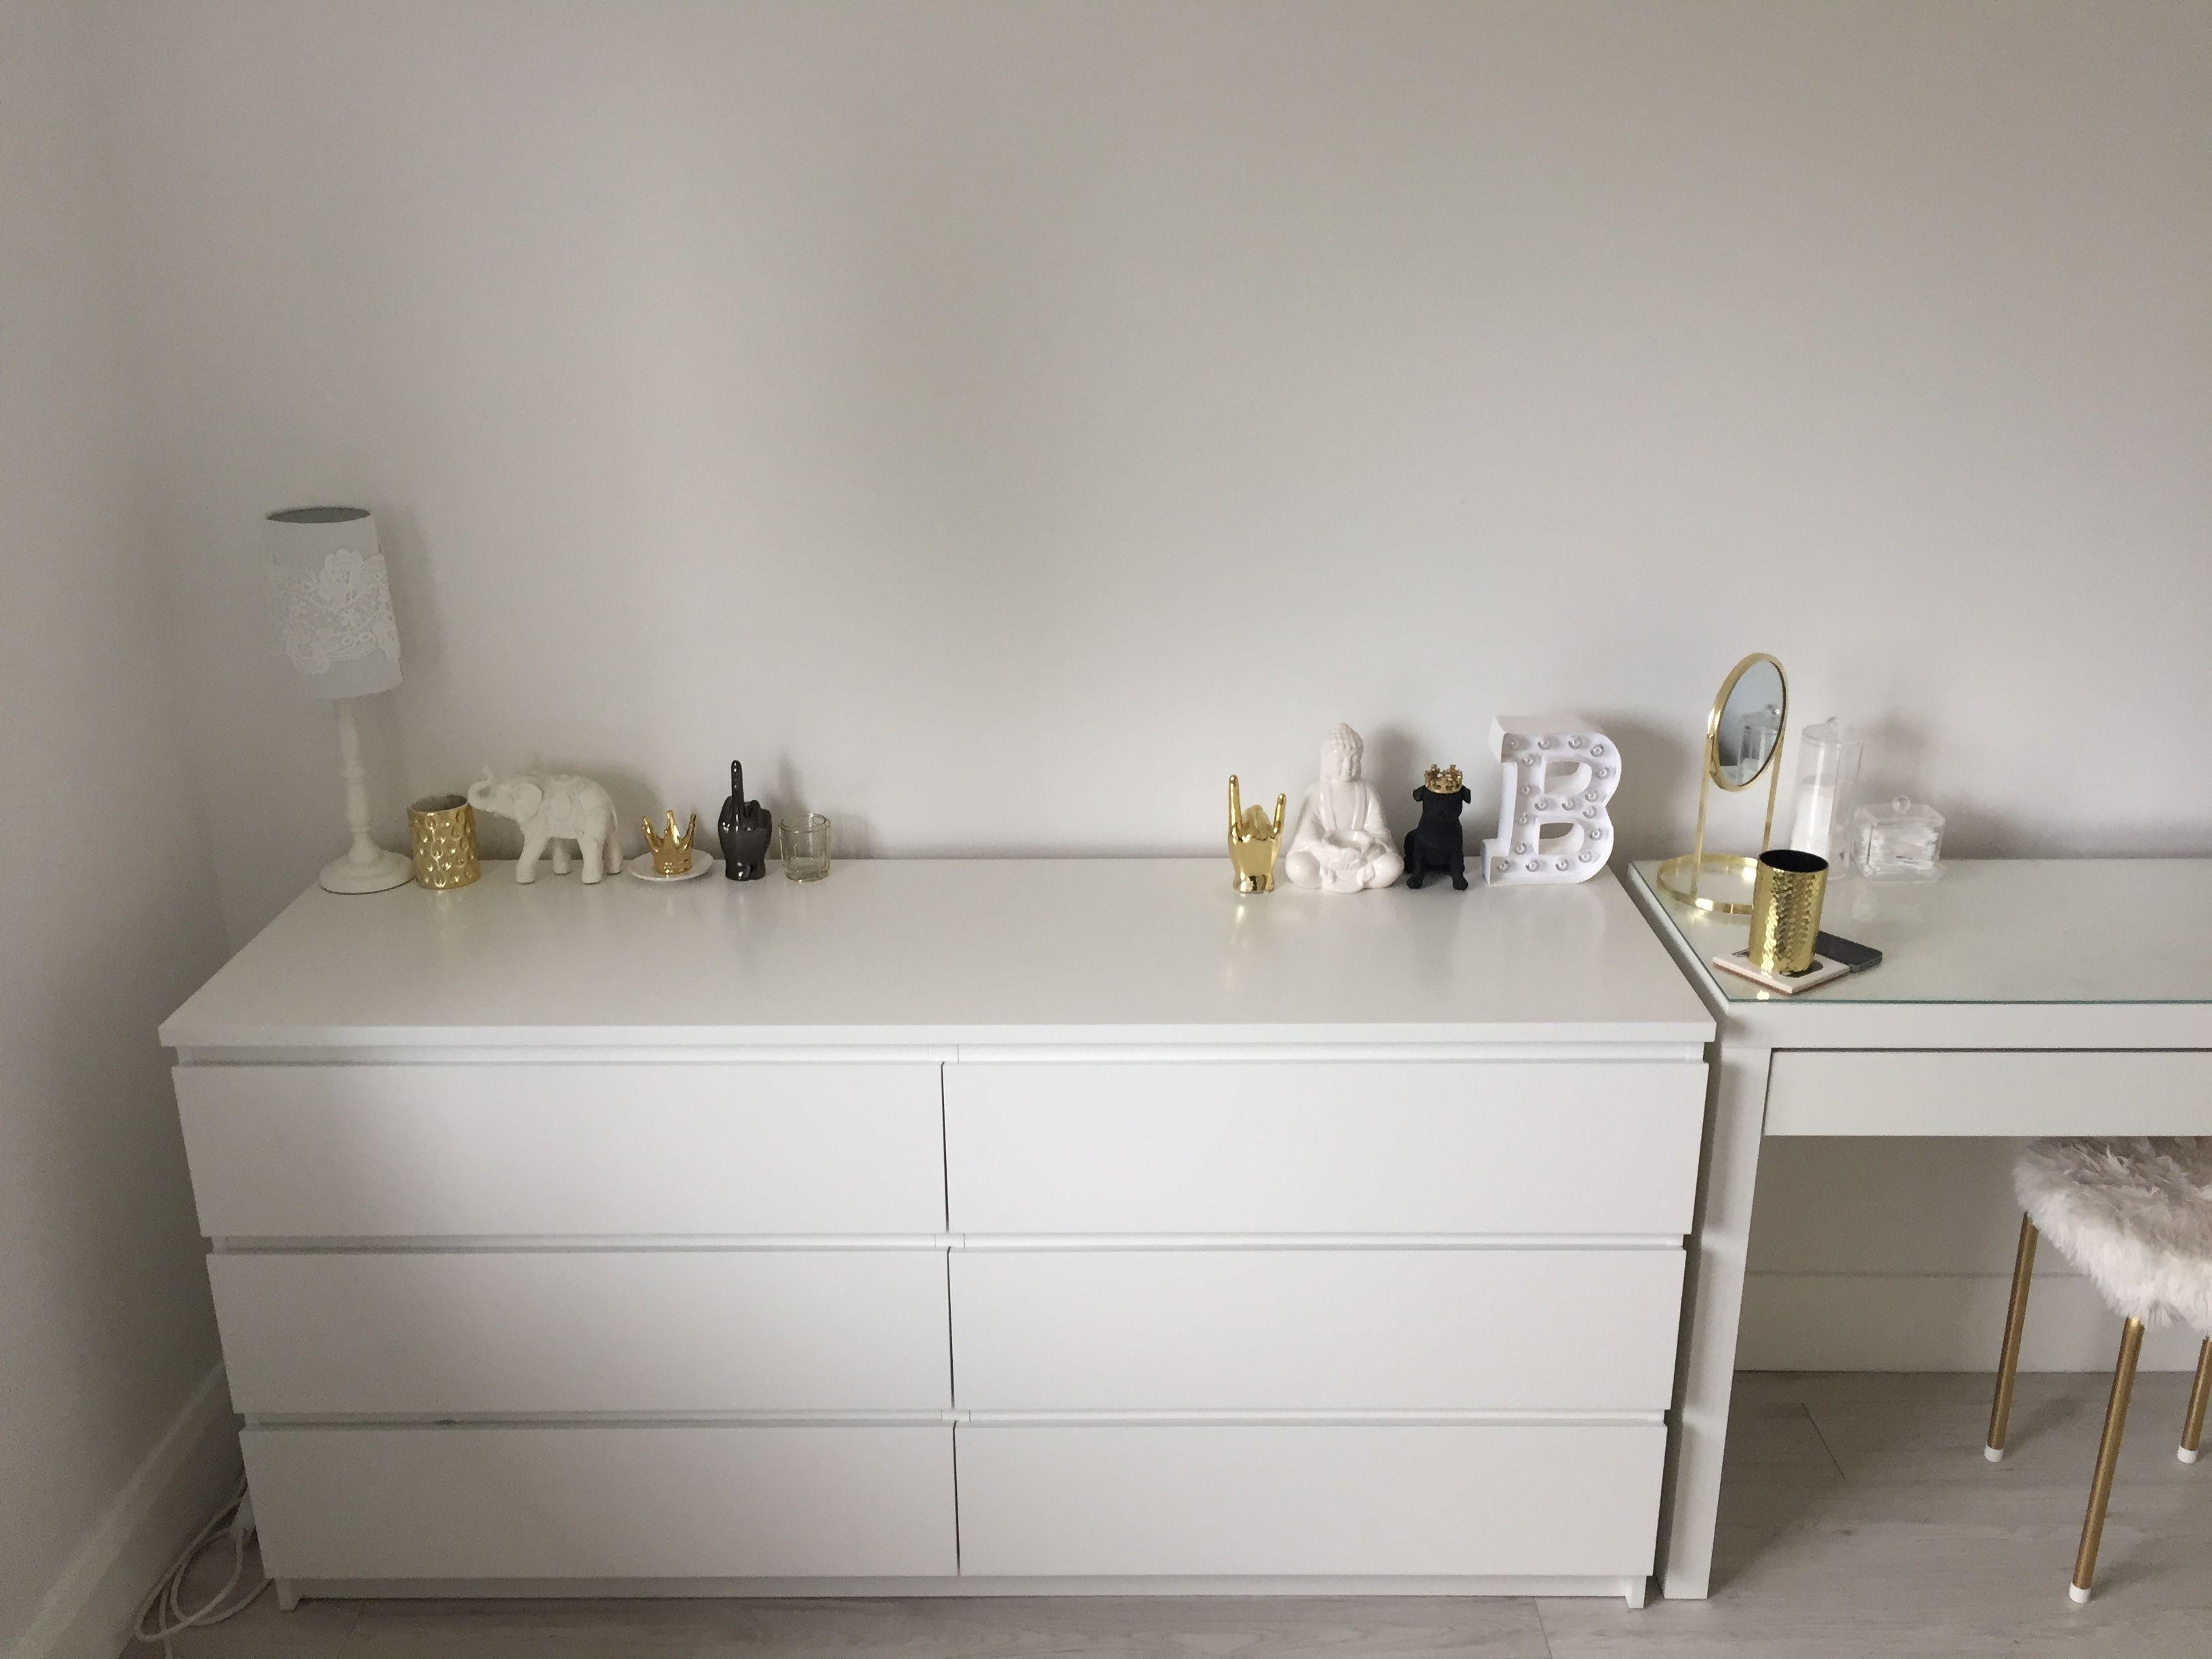 Ikea Malm Credenza : Ikea malm six drawers dresser and